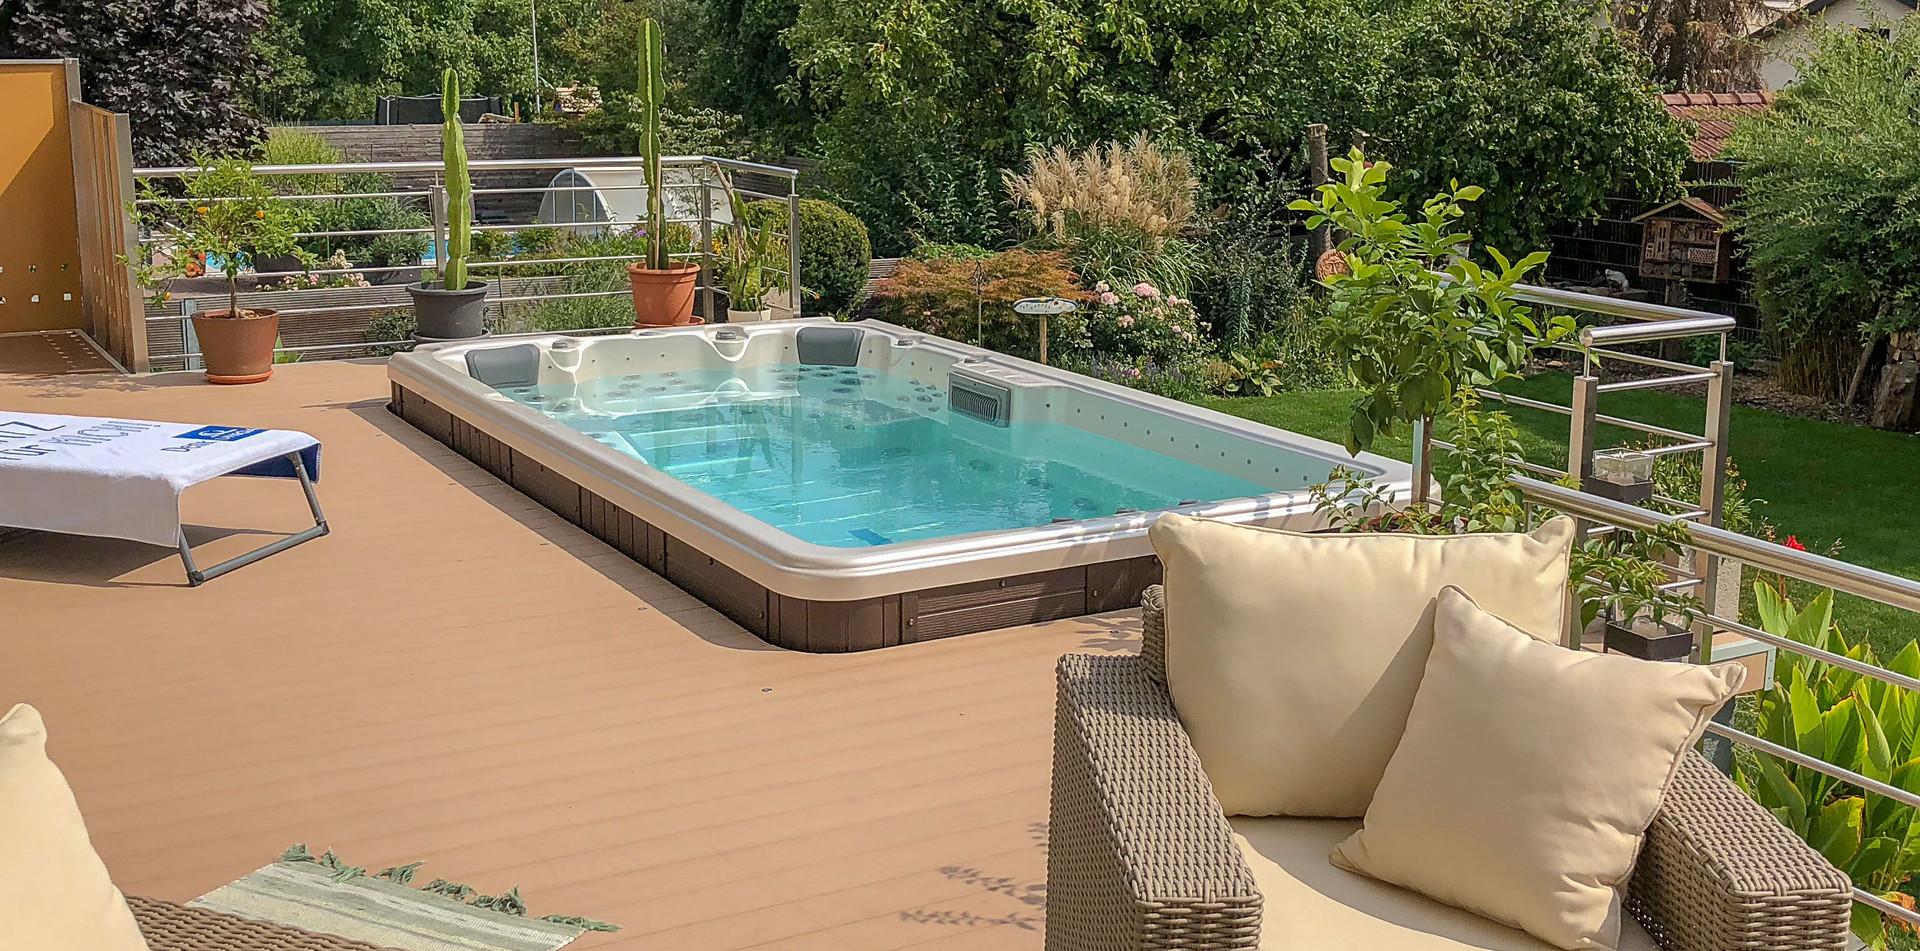 LOUNGE 4100 Schwimmspa, Swim Spa, Fripool